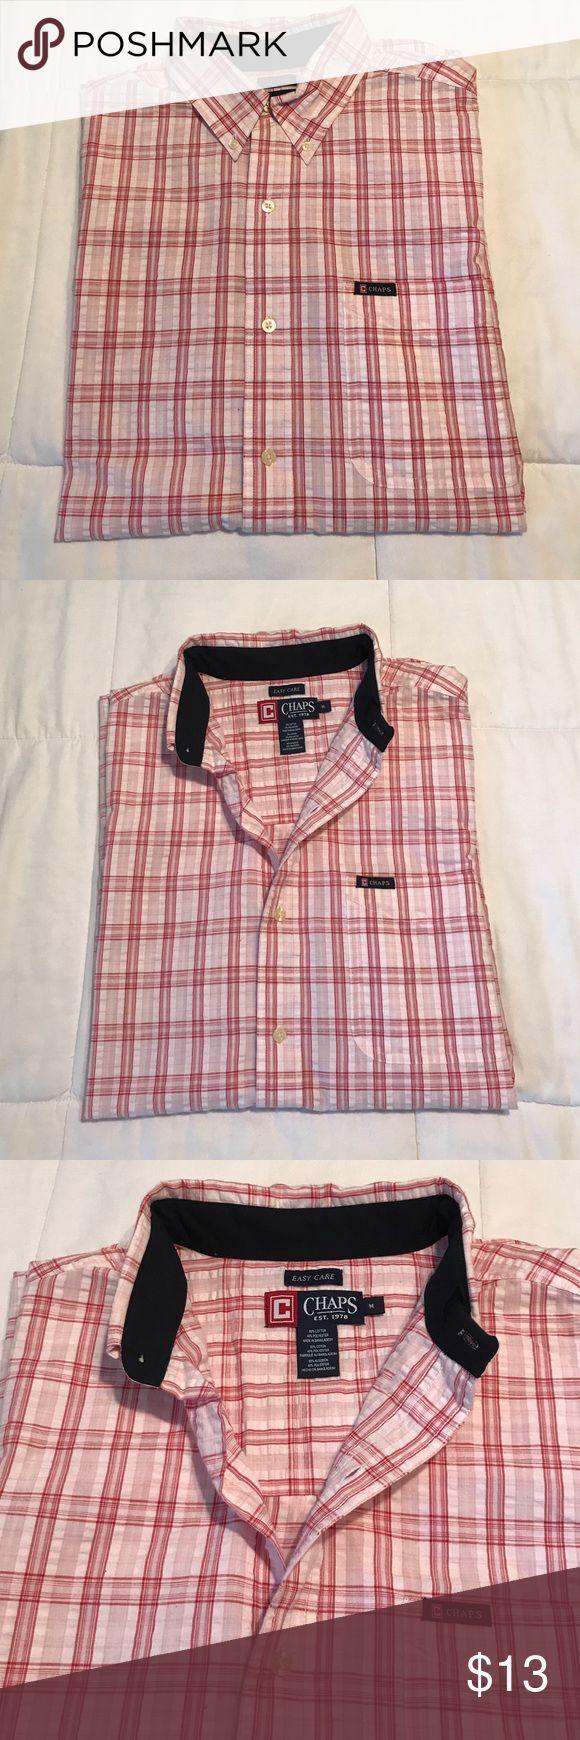 Chaps Ralph Lauren men's shirt. Chaps Ralph Lauren men's shirt. EUC. Size M. Short sleeve Chaps Ralph Lauren Shirts Casual Button Down Shirts